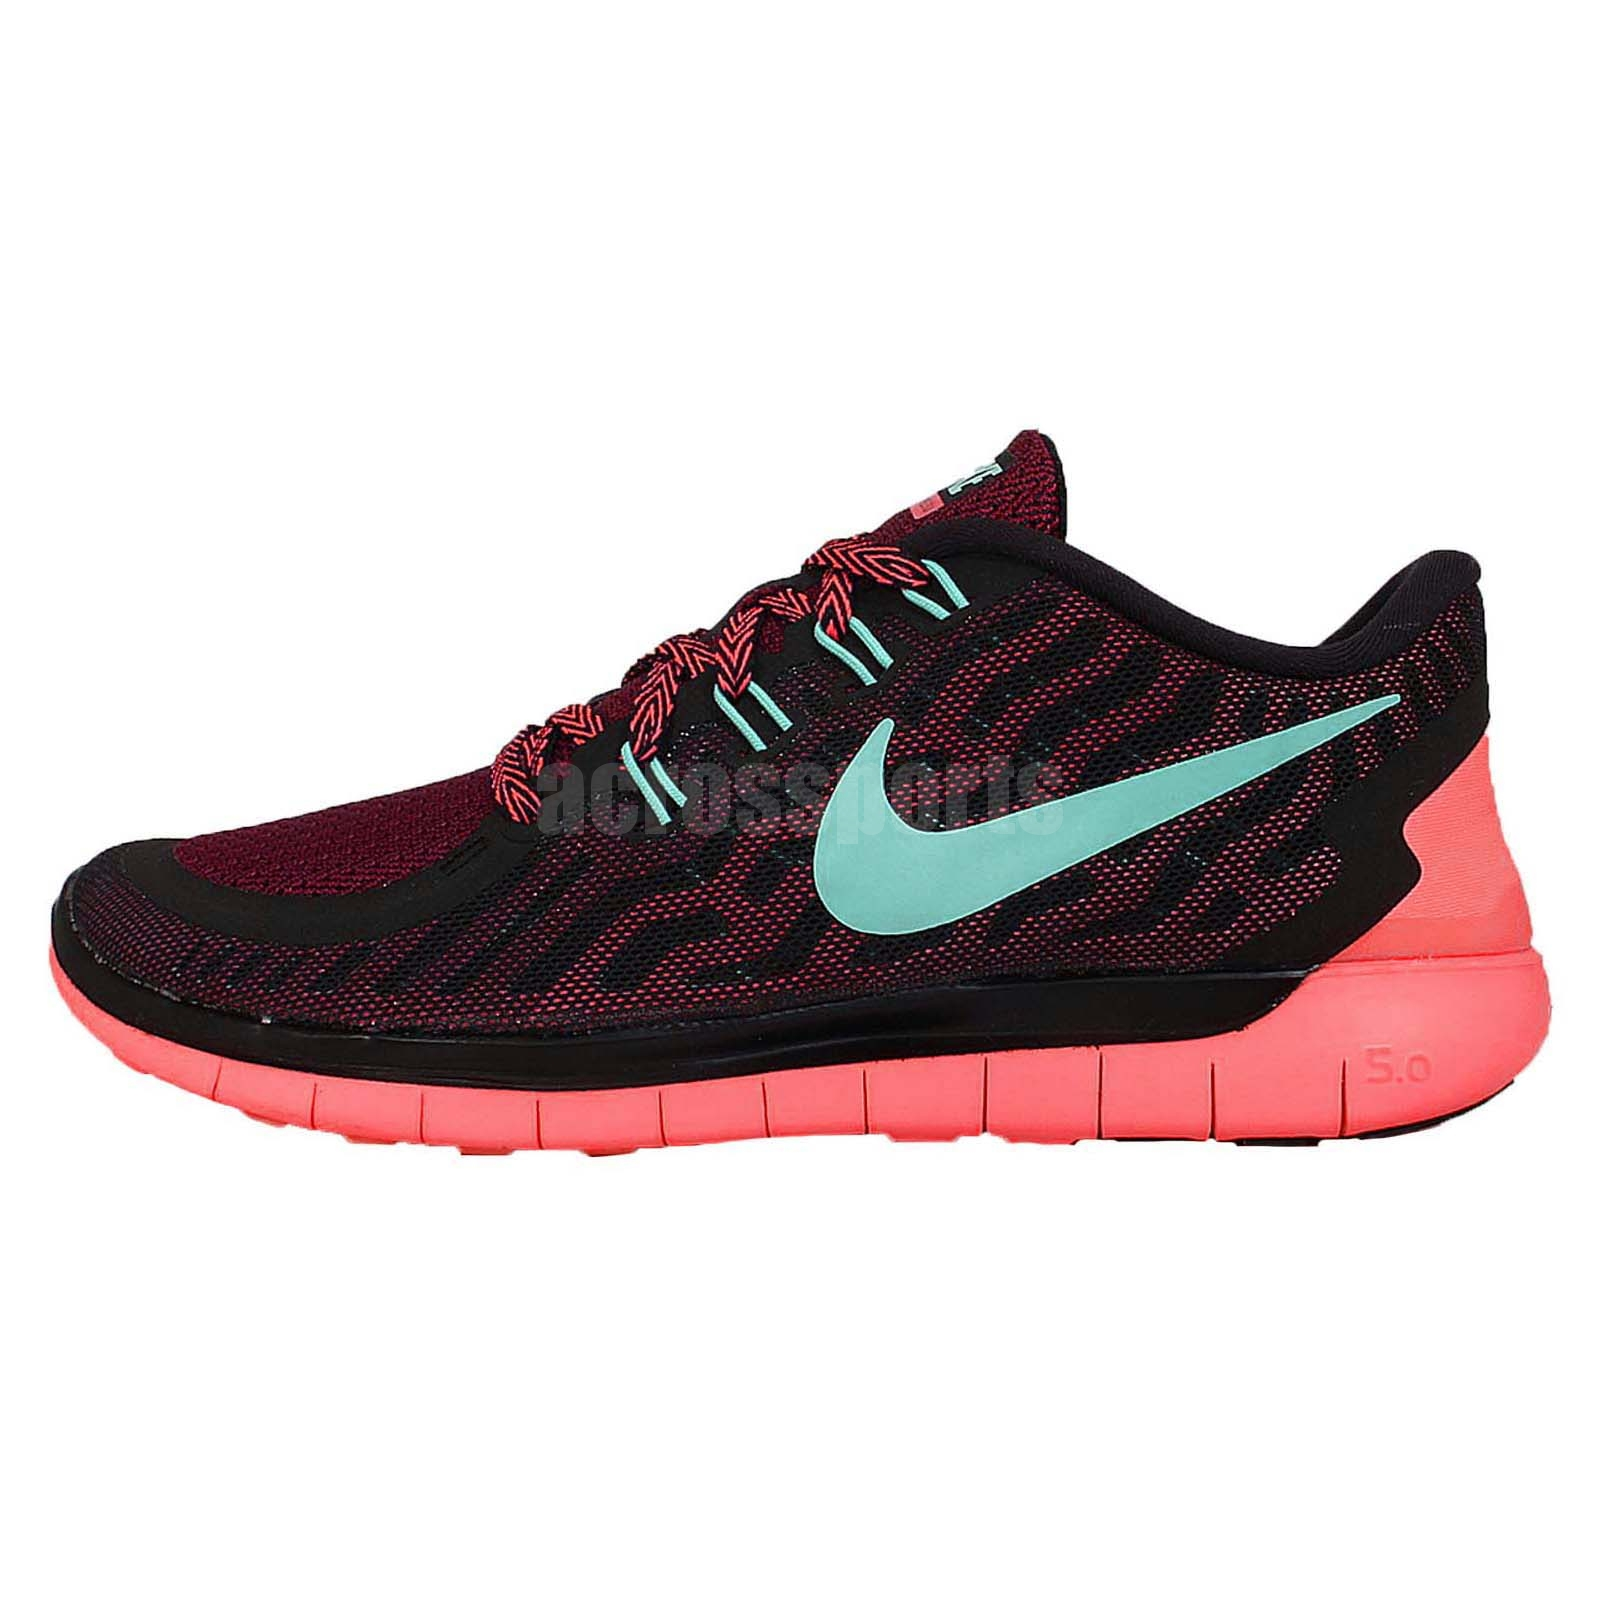 Nike Free Tr Fit 5.0 Leopard Laces